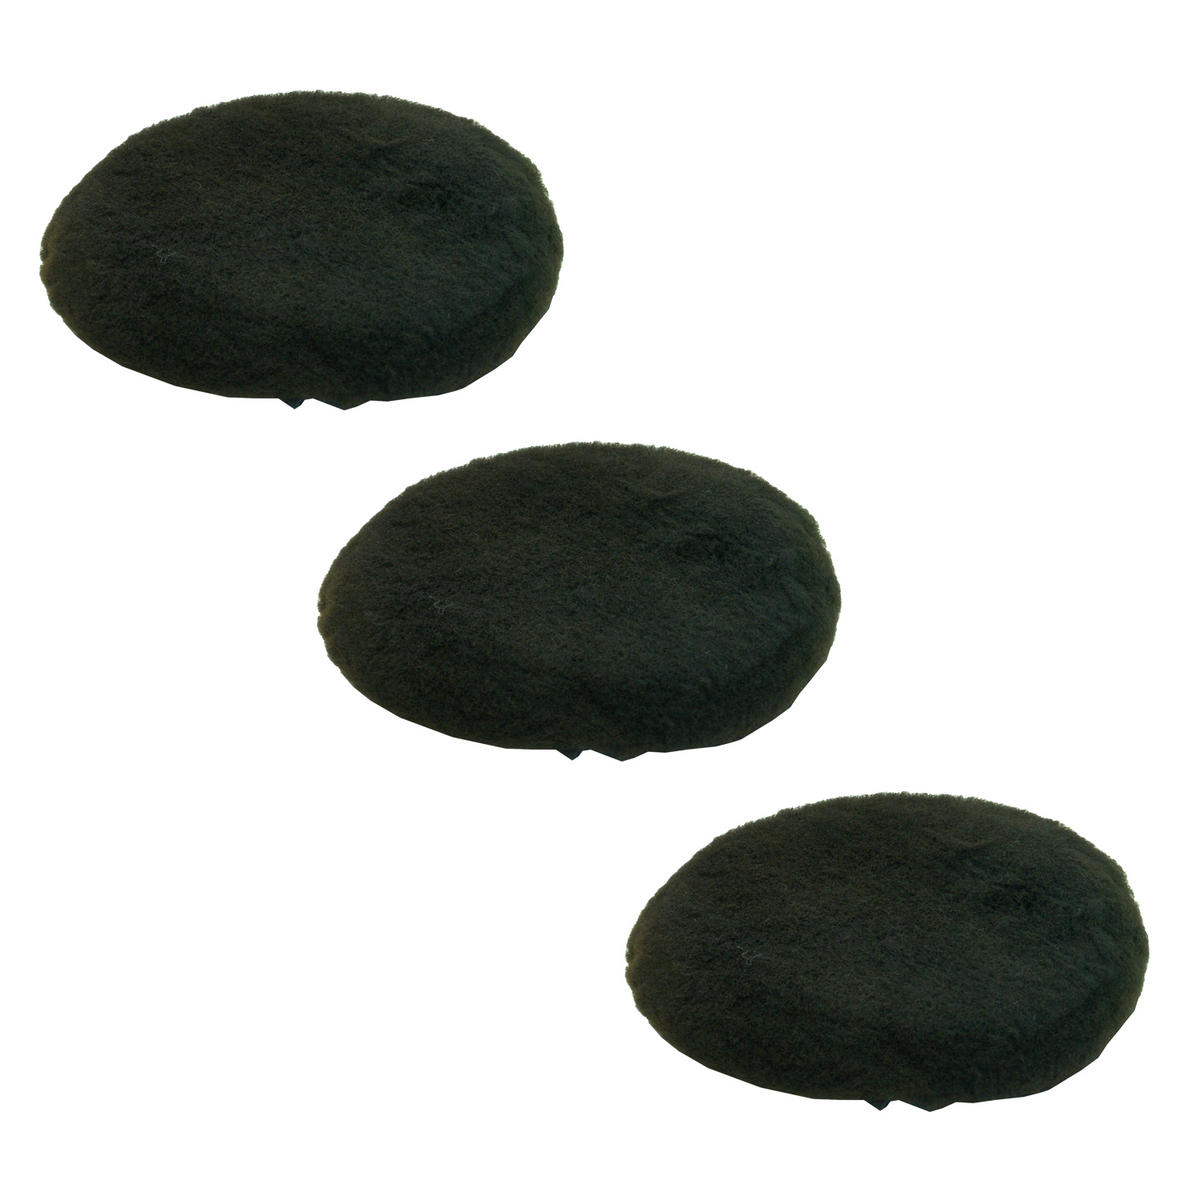 Car Cleaning 200mm Black Soft Lambs Wool Polishing Buffing Detailing Mop Head x 3